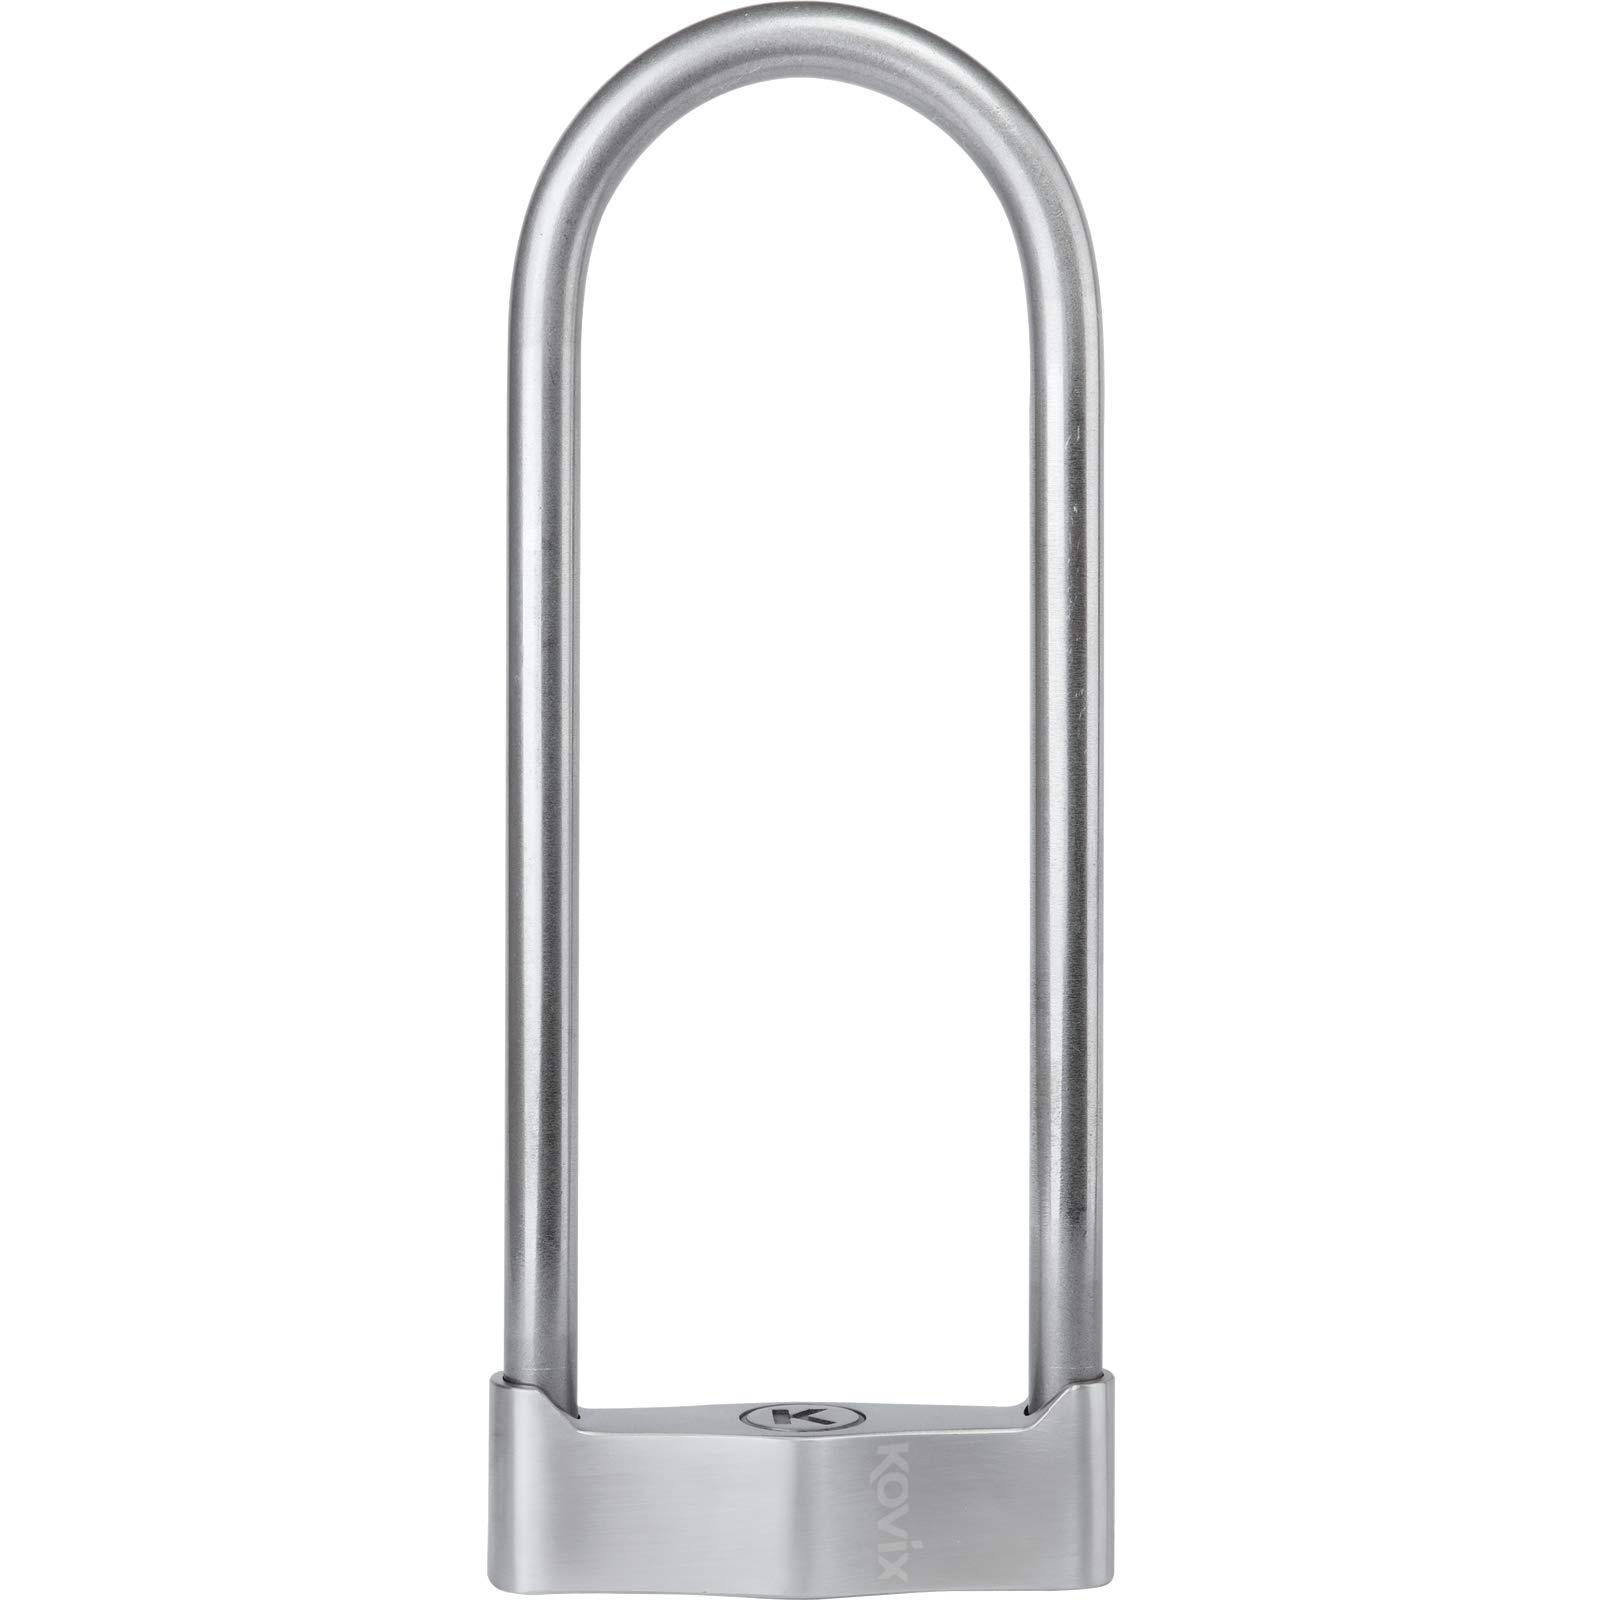 Kovix U-Lock KSU310S by Kovix (Image #1)